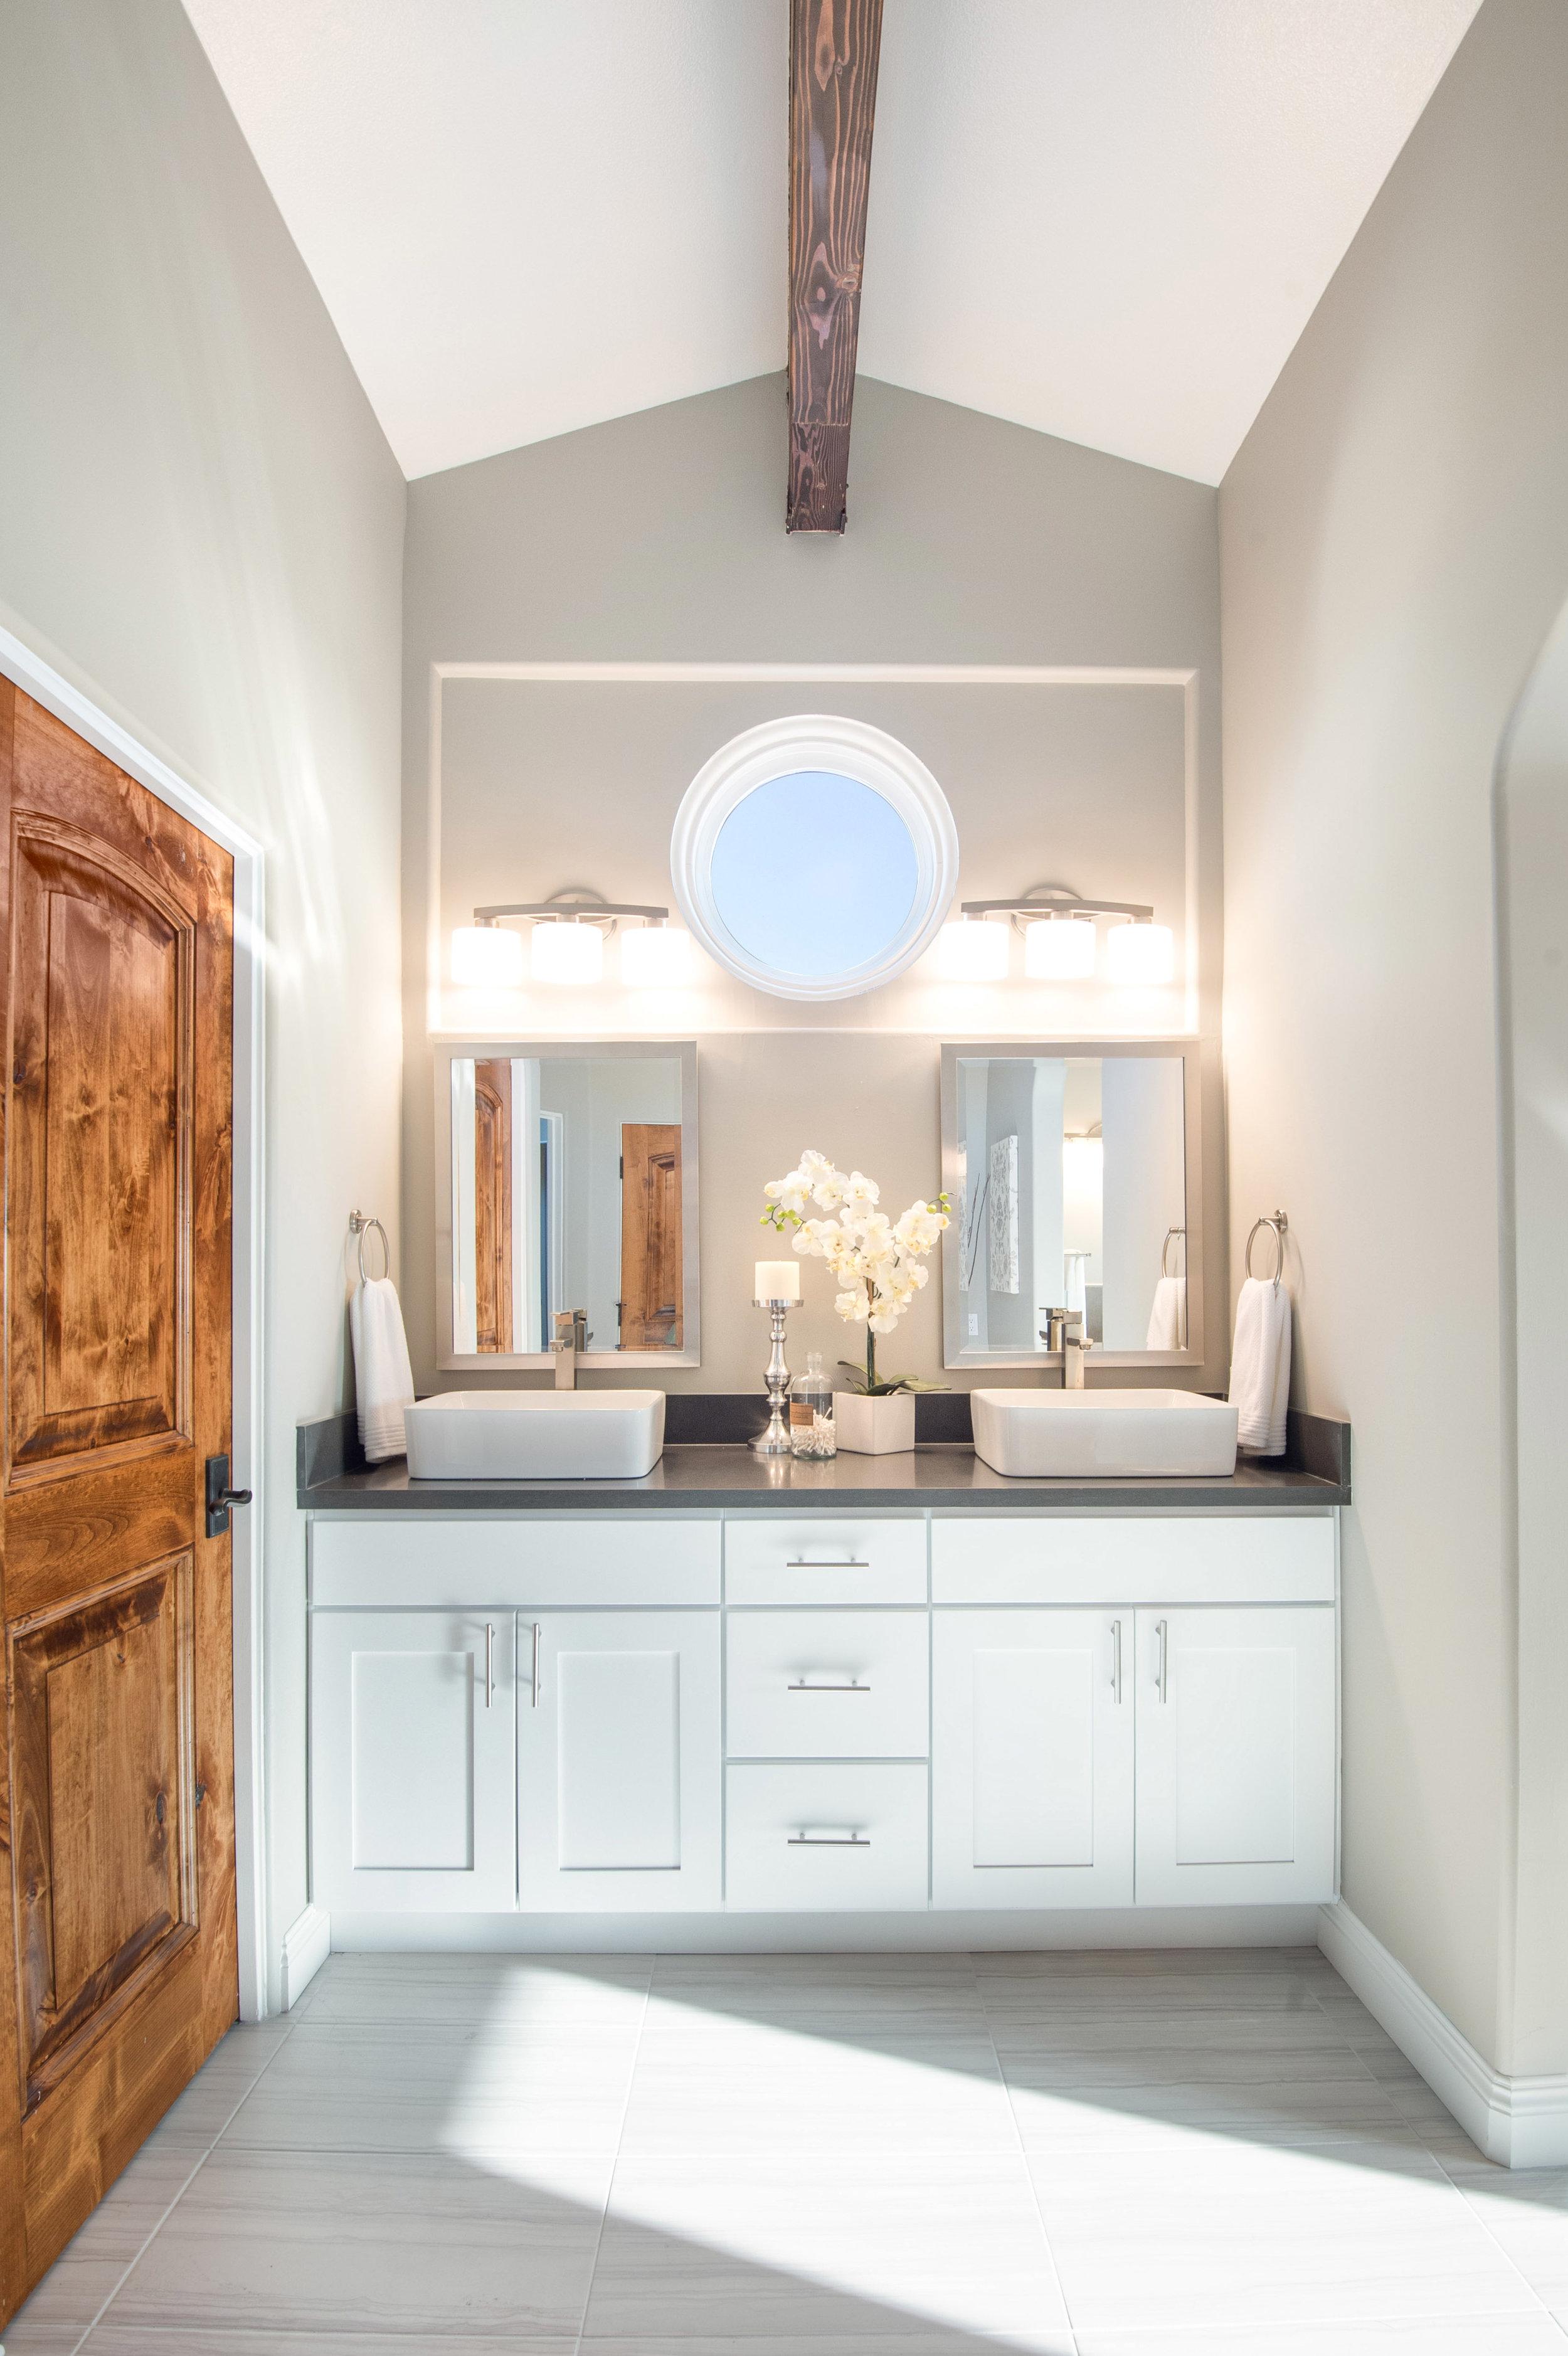 011 6130 Via Cabrillo For Sale Lease The Malibu Life Team Luxury Real Estate.jpg